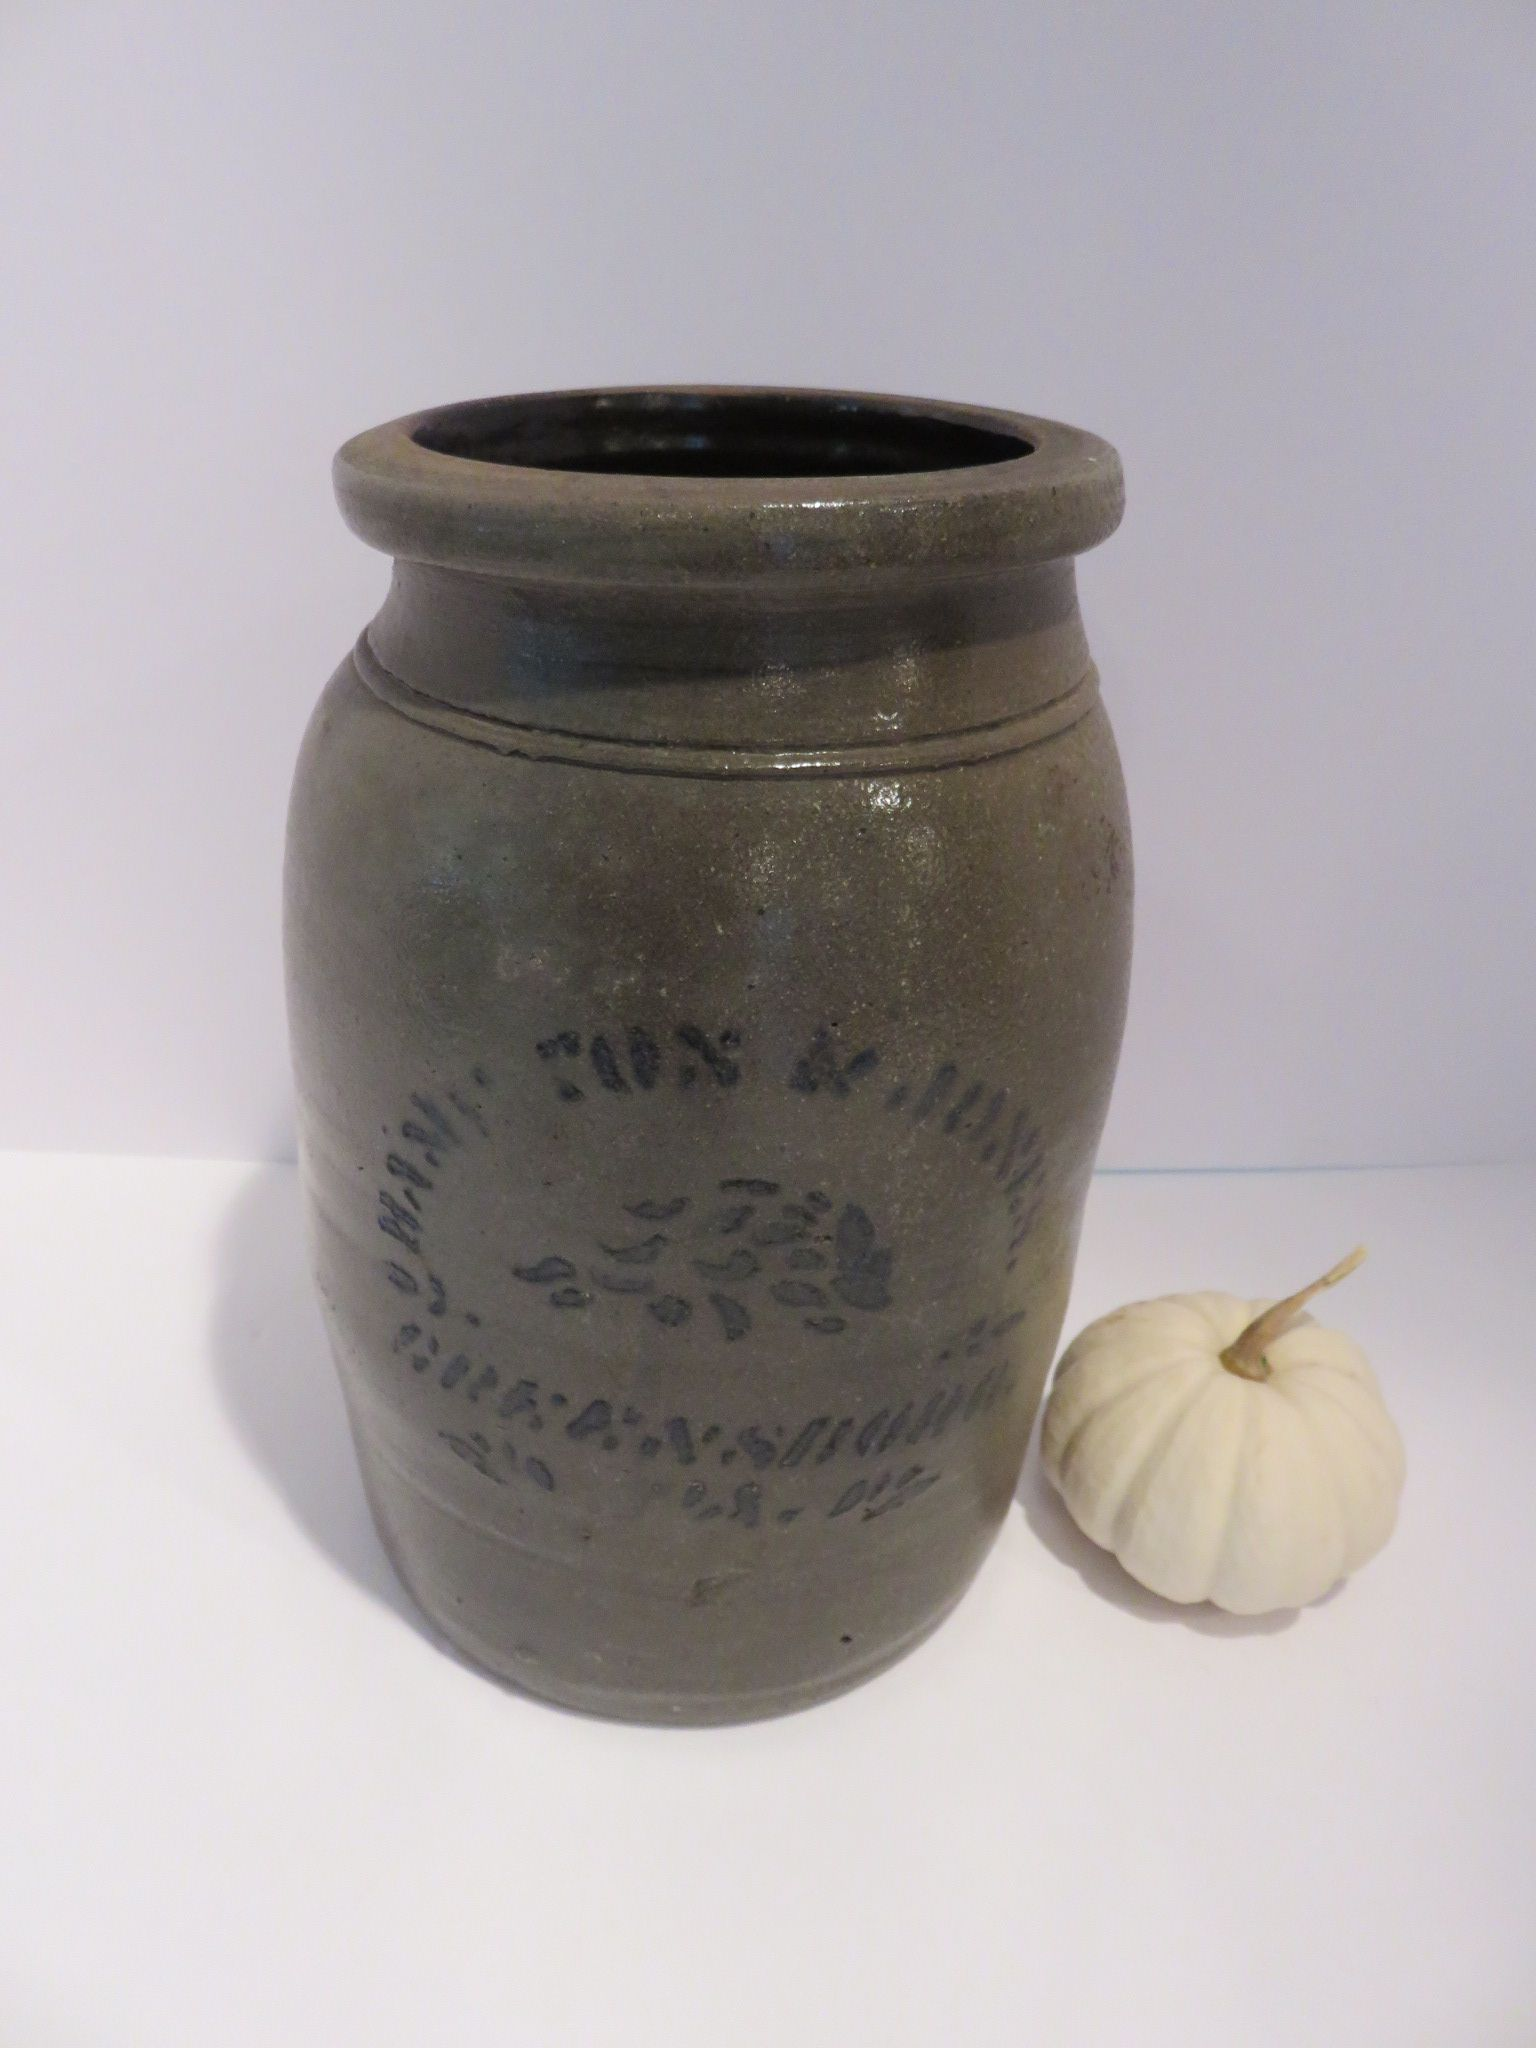 Ebay: Antique Hamilton & Jones preserves crock with cobalt stencil